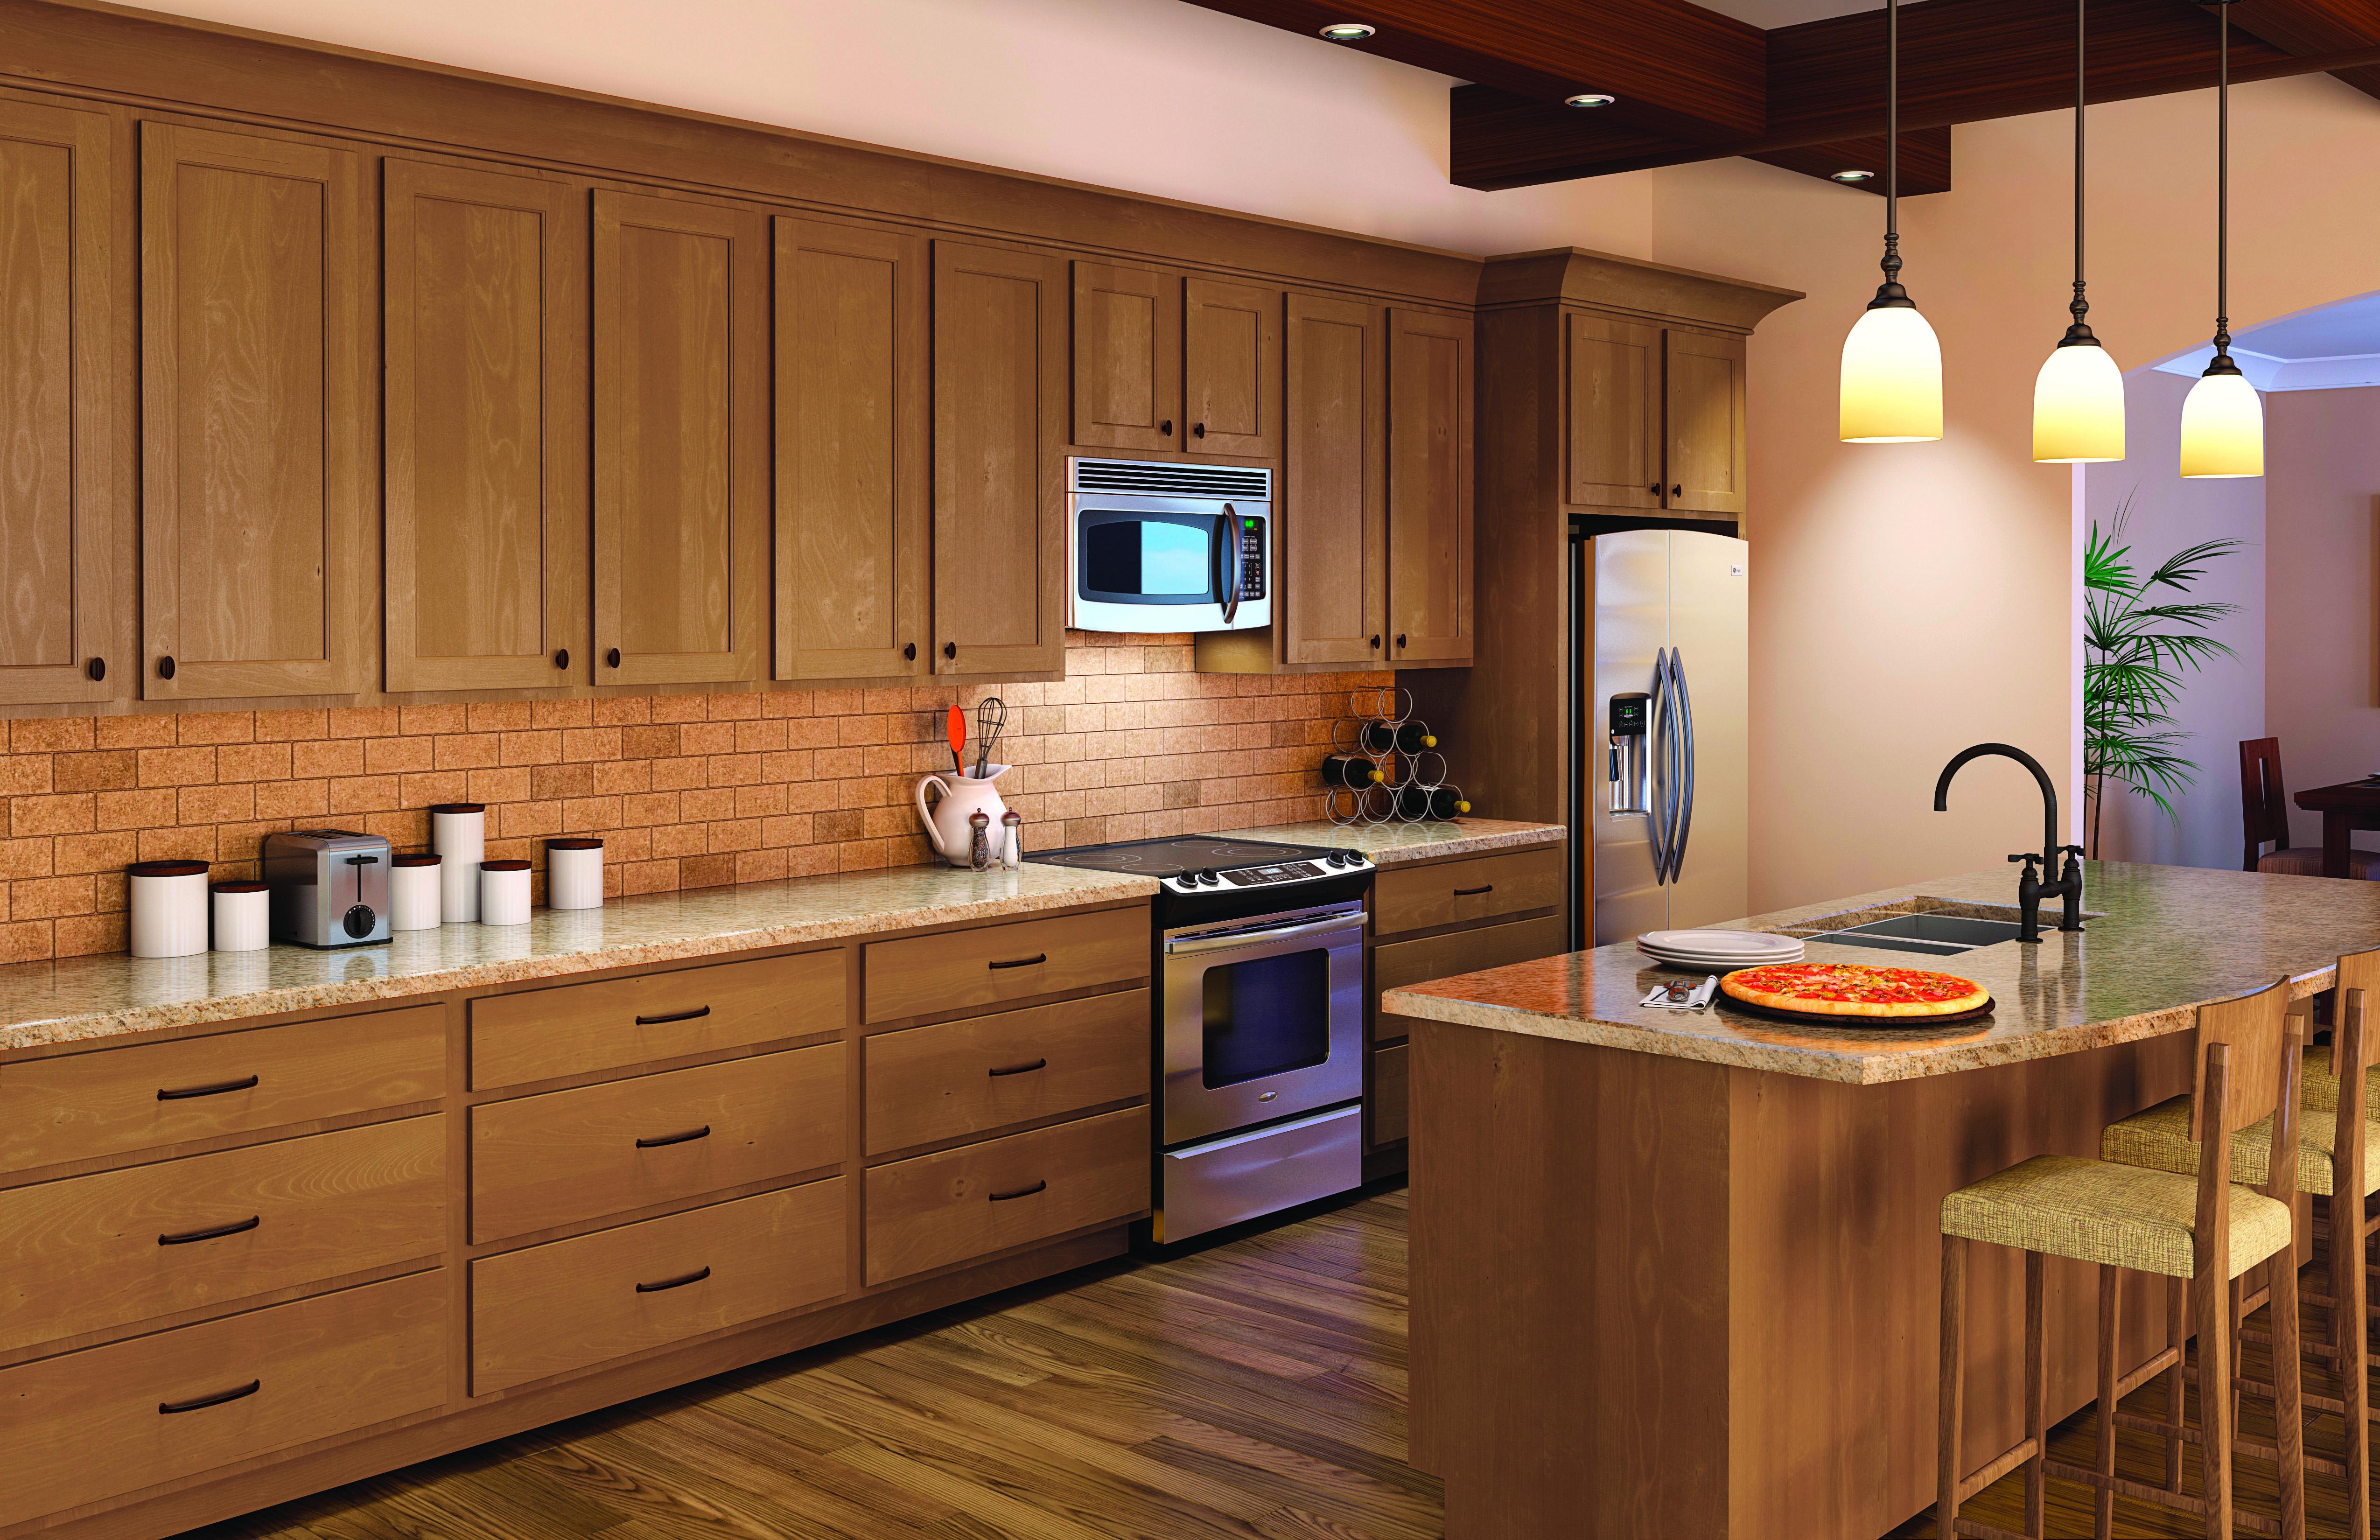 These Echelon Hargrove Kitchen Cabinets Are Beautiful Kitchen Cabinets Models Kitchen Cabinet Remodel Kitchen Design Decor